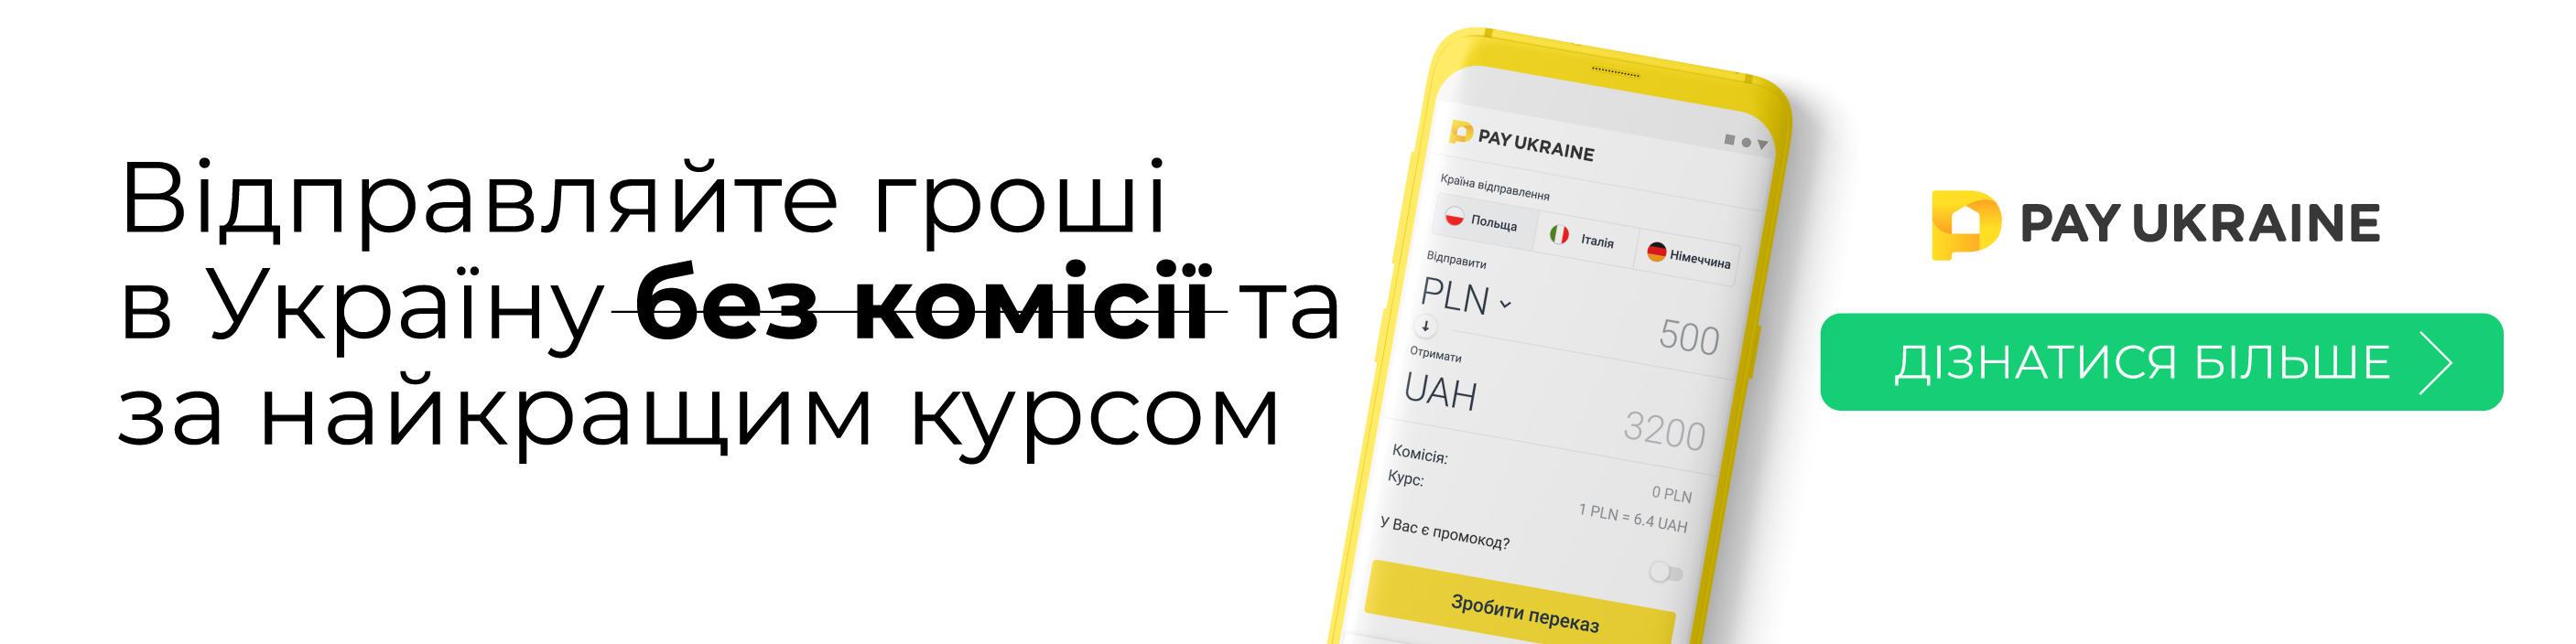 PayUkr